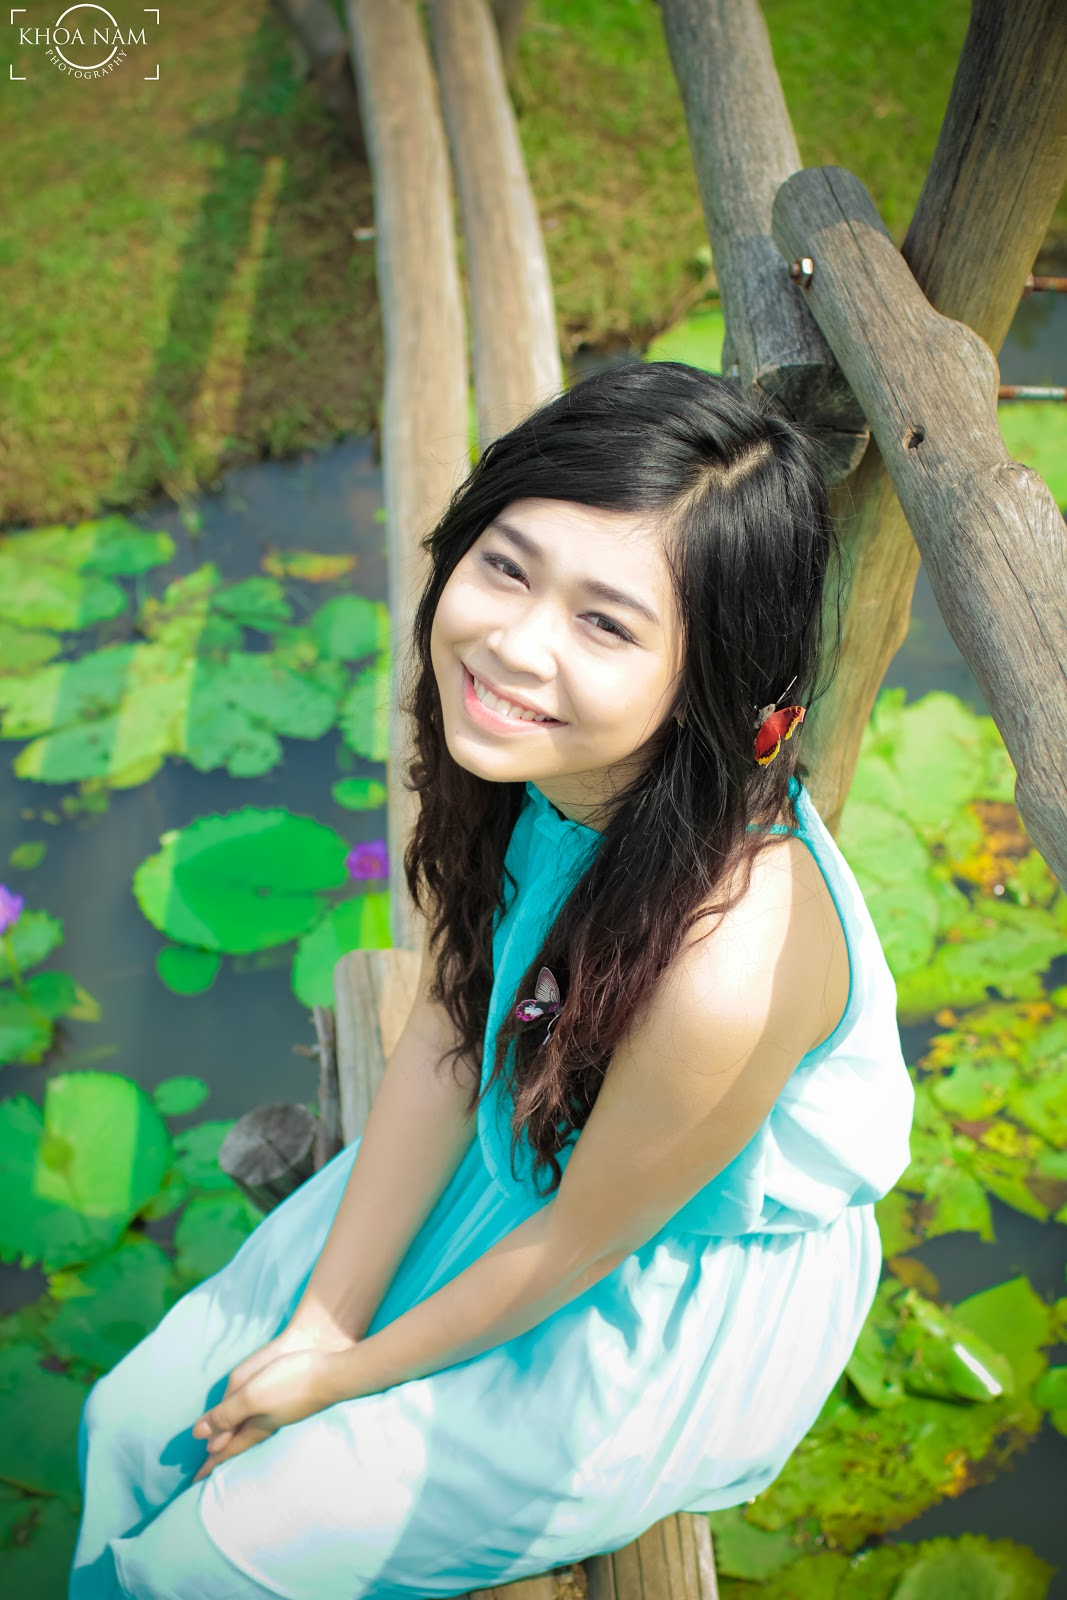 Vietnamese Beauty Girls by Khoa Nam Part 6 (74 pics)